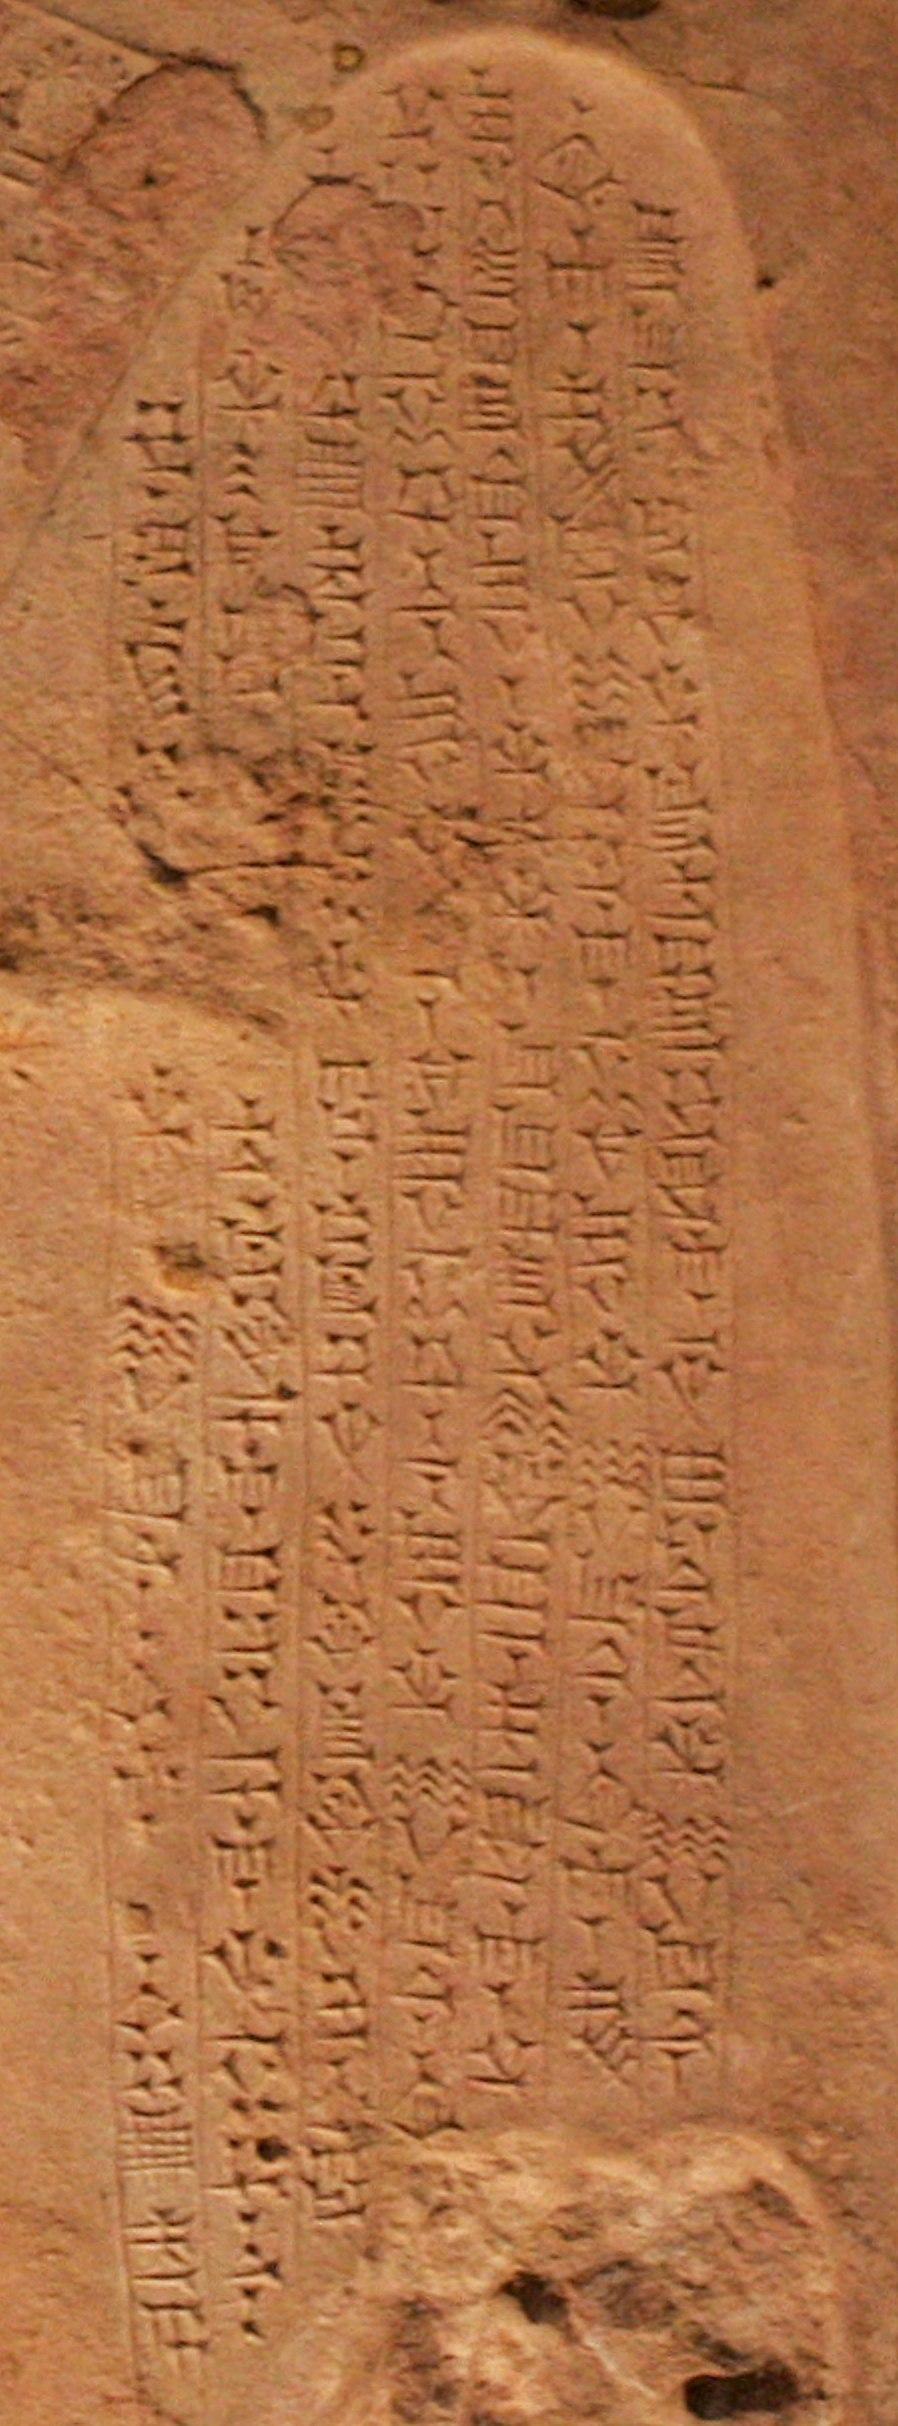 Naram-Sin stele inscription in Elamite